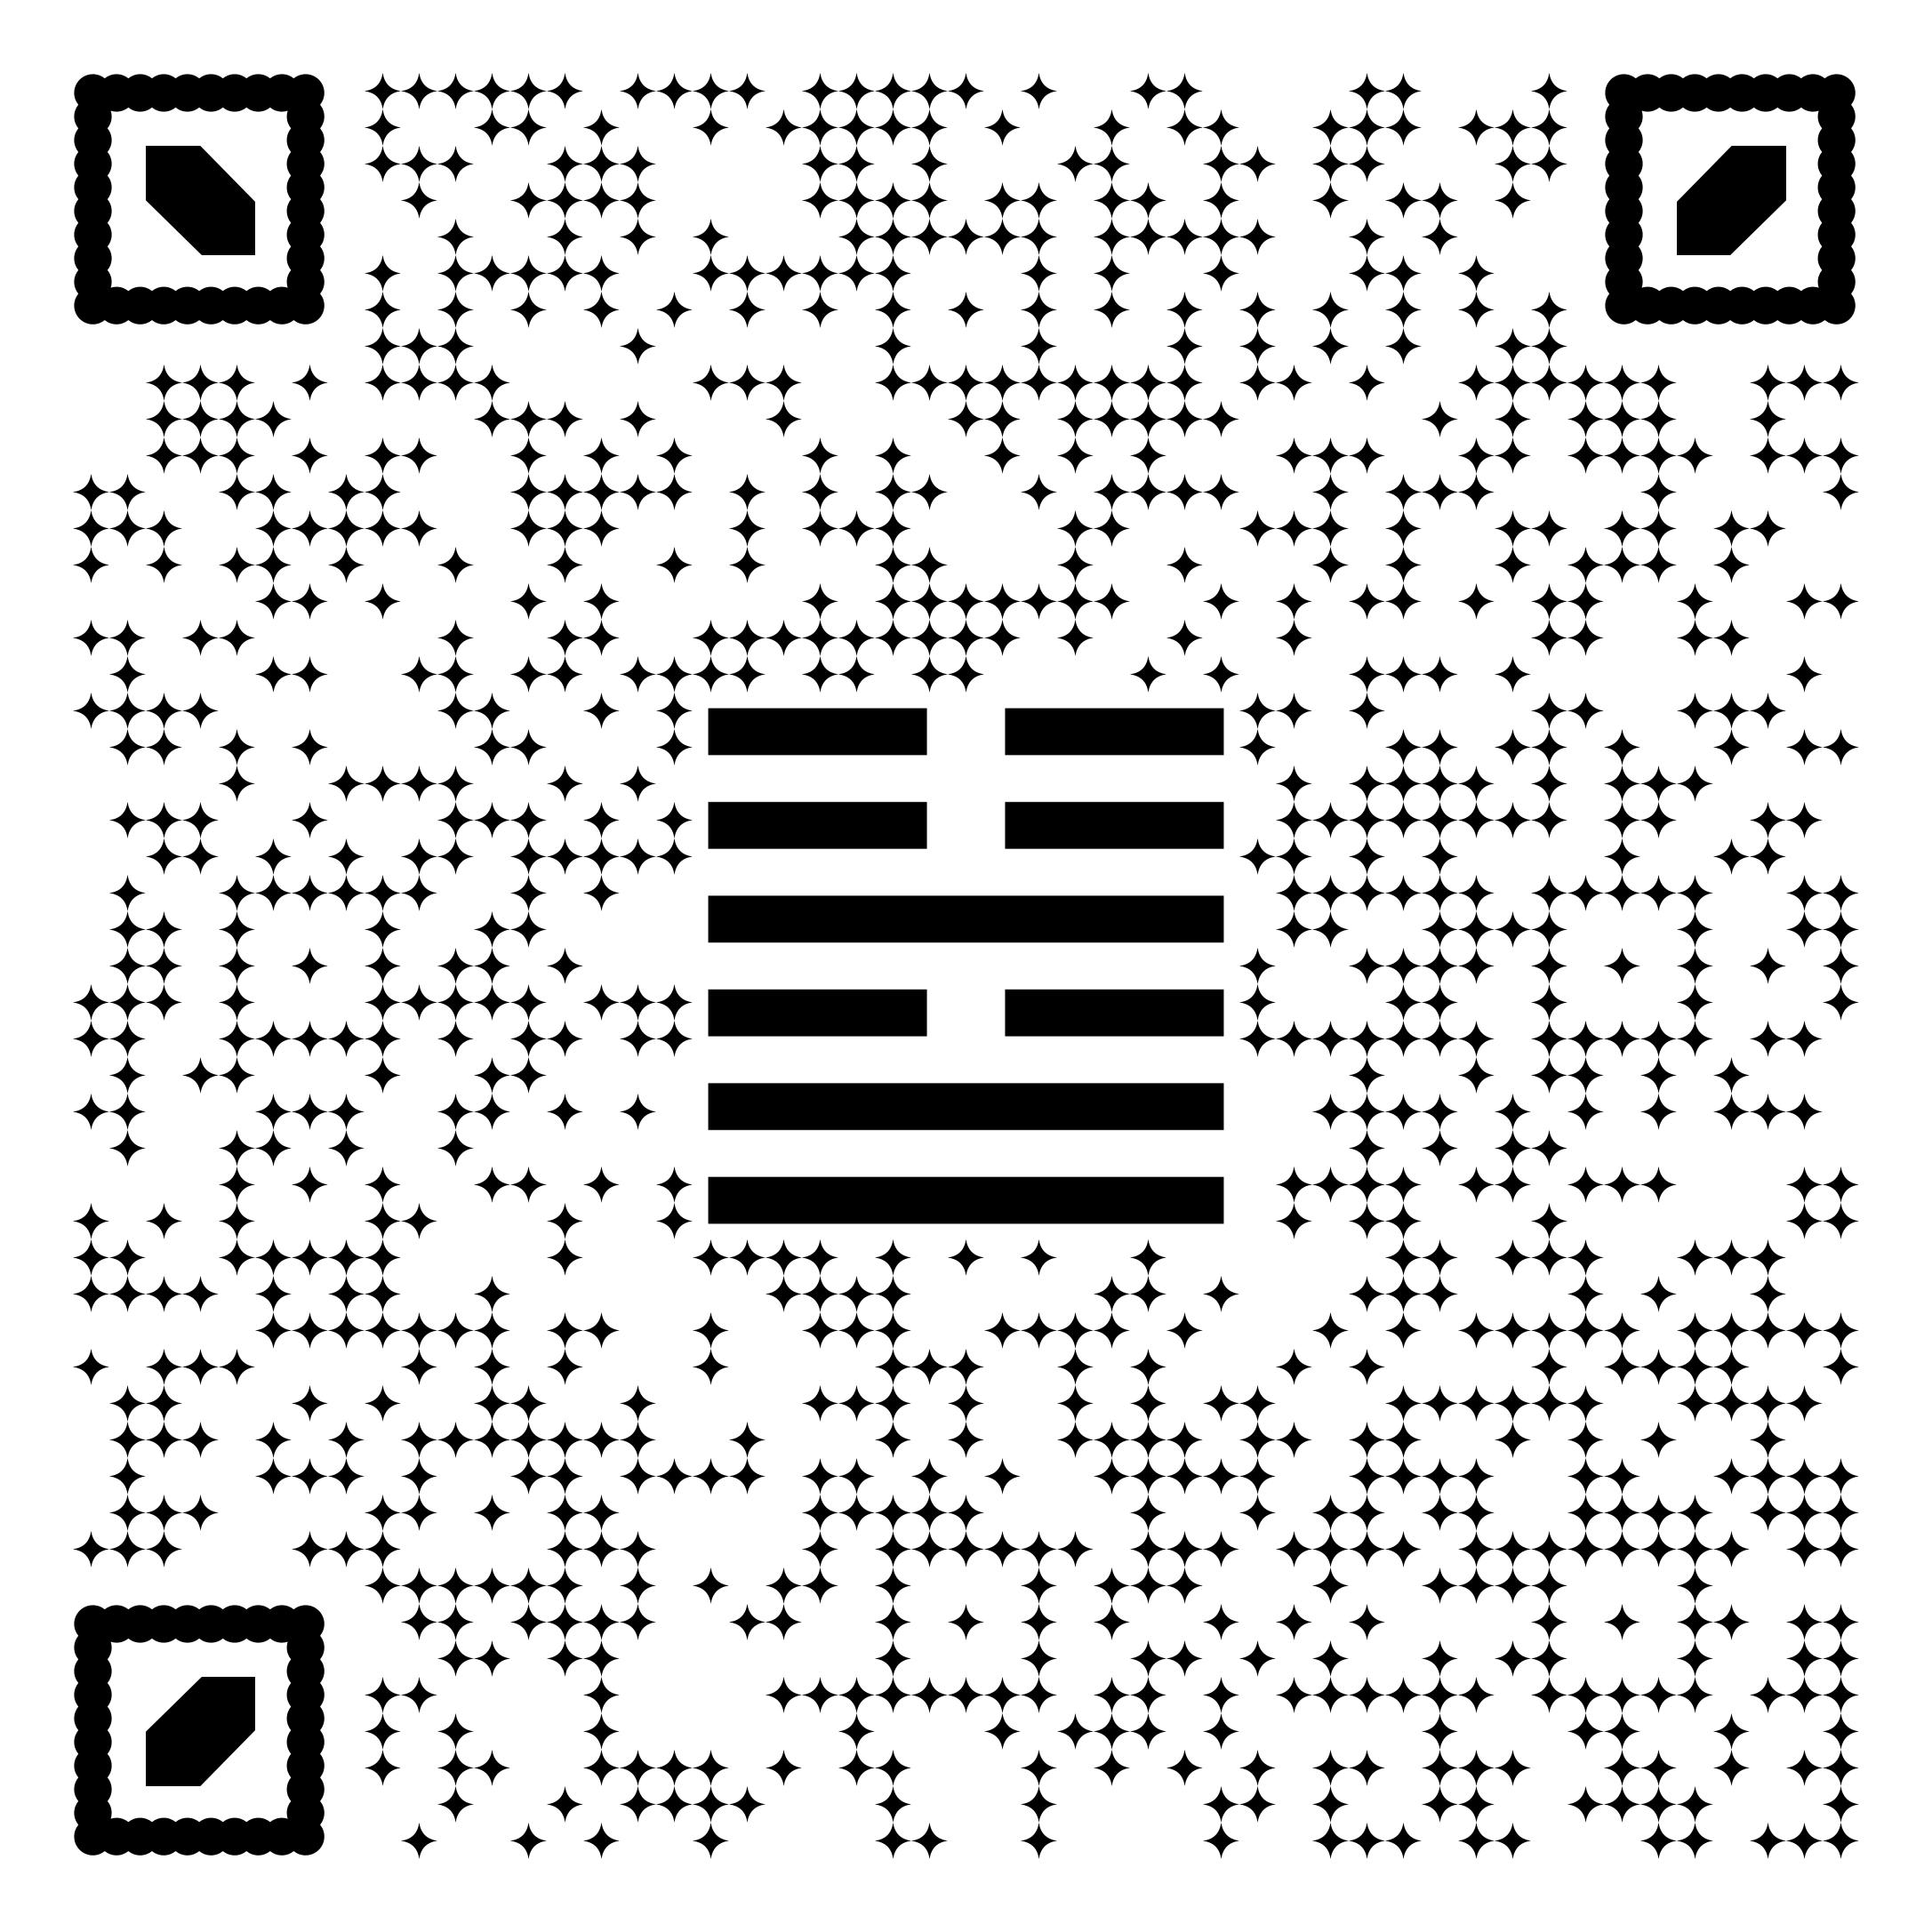 qr-code-54.png